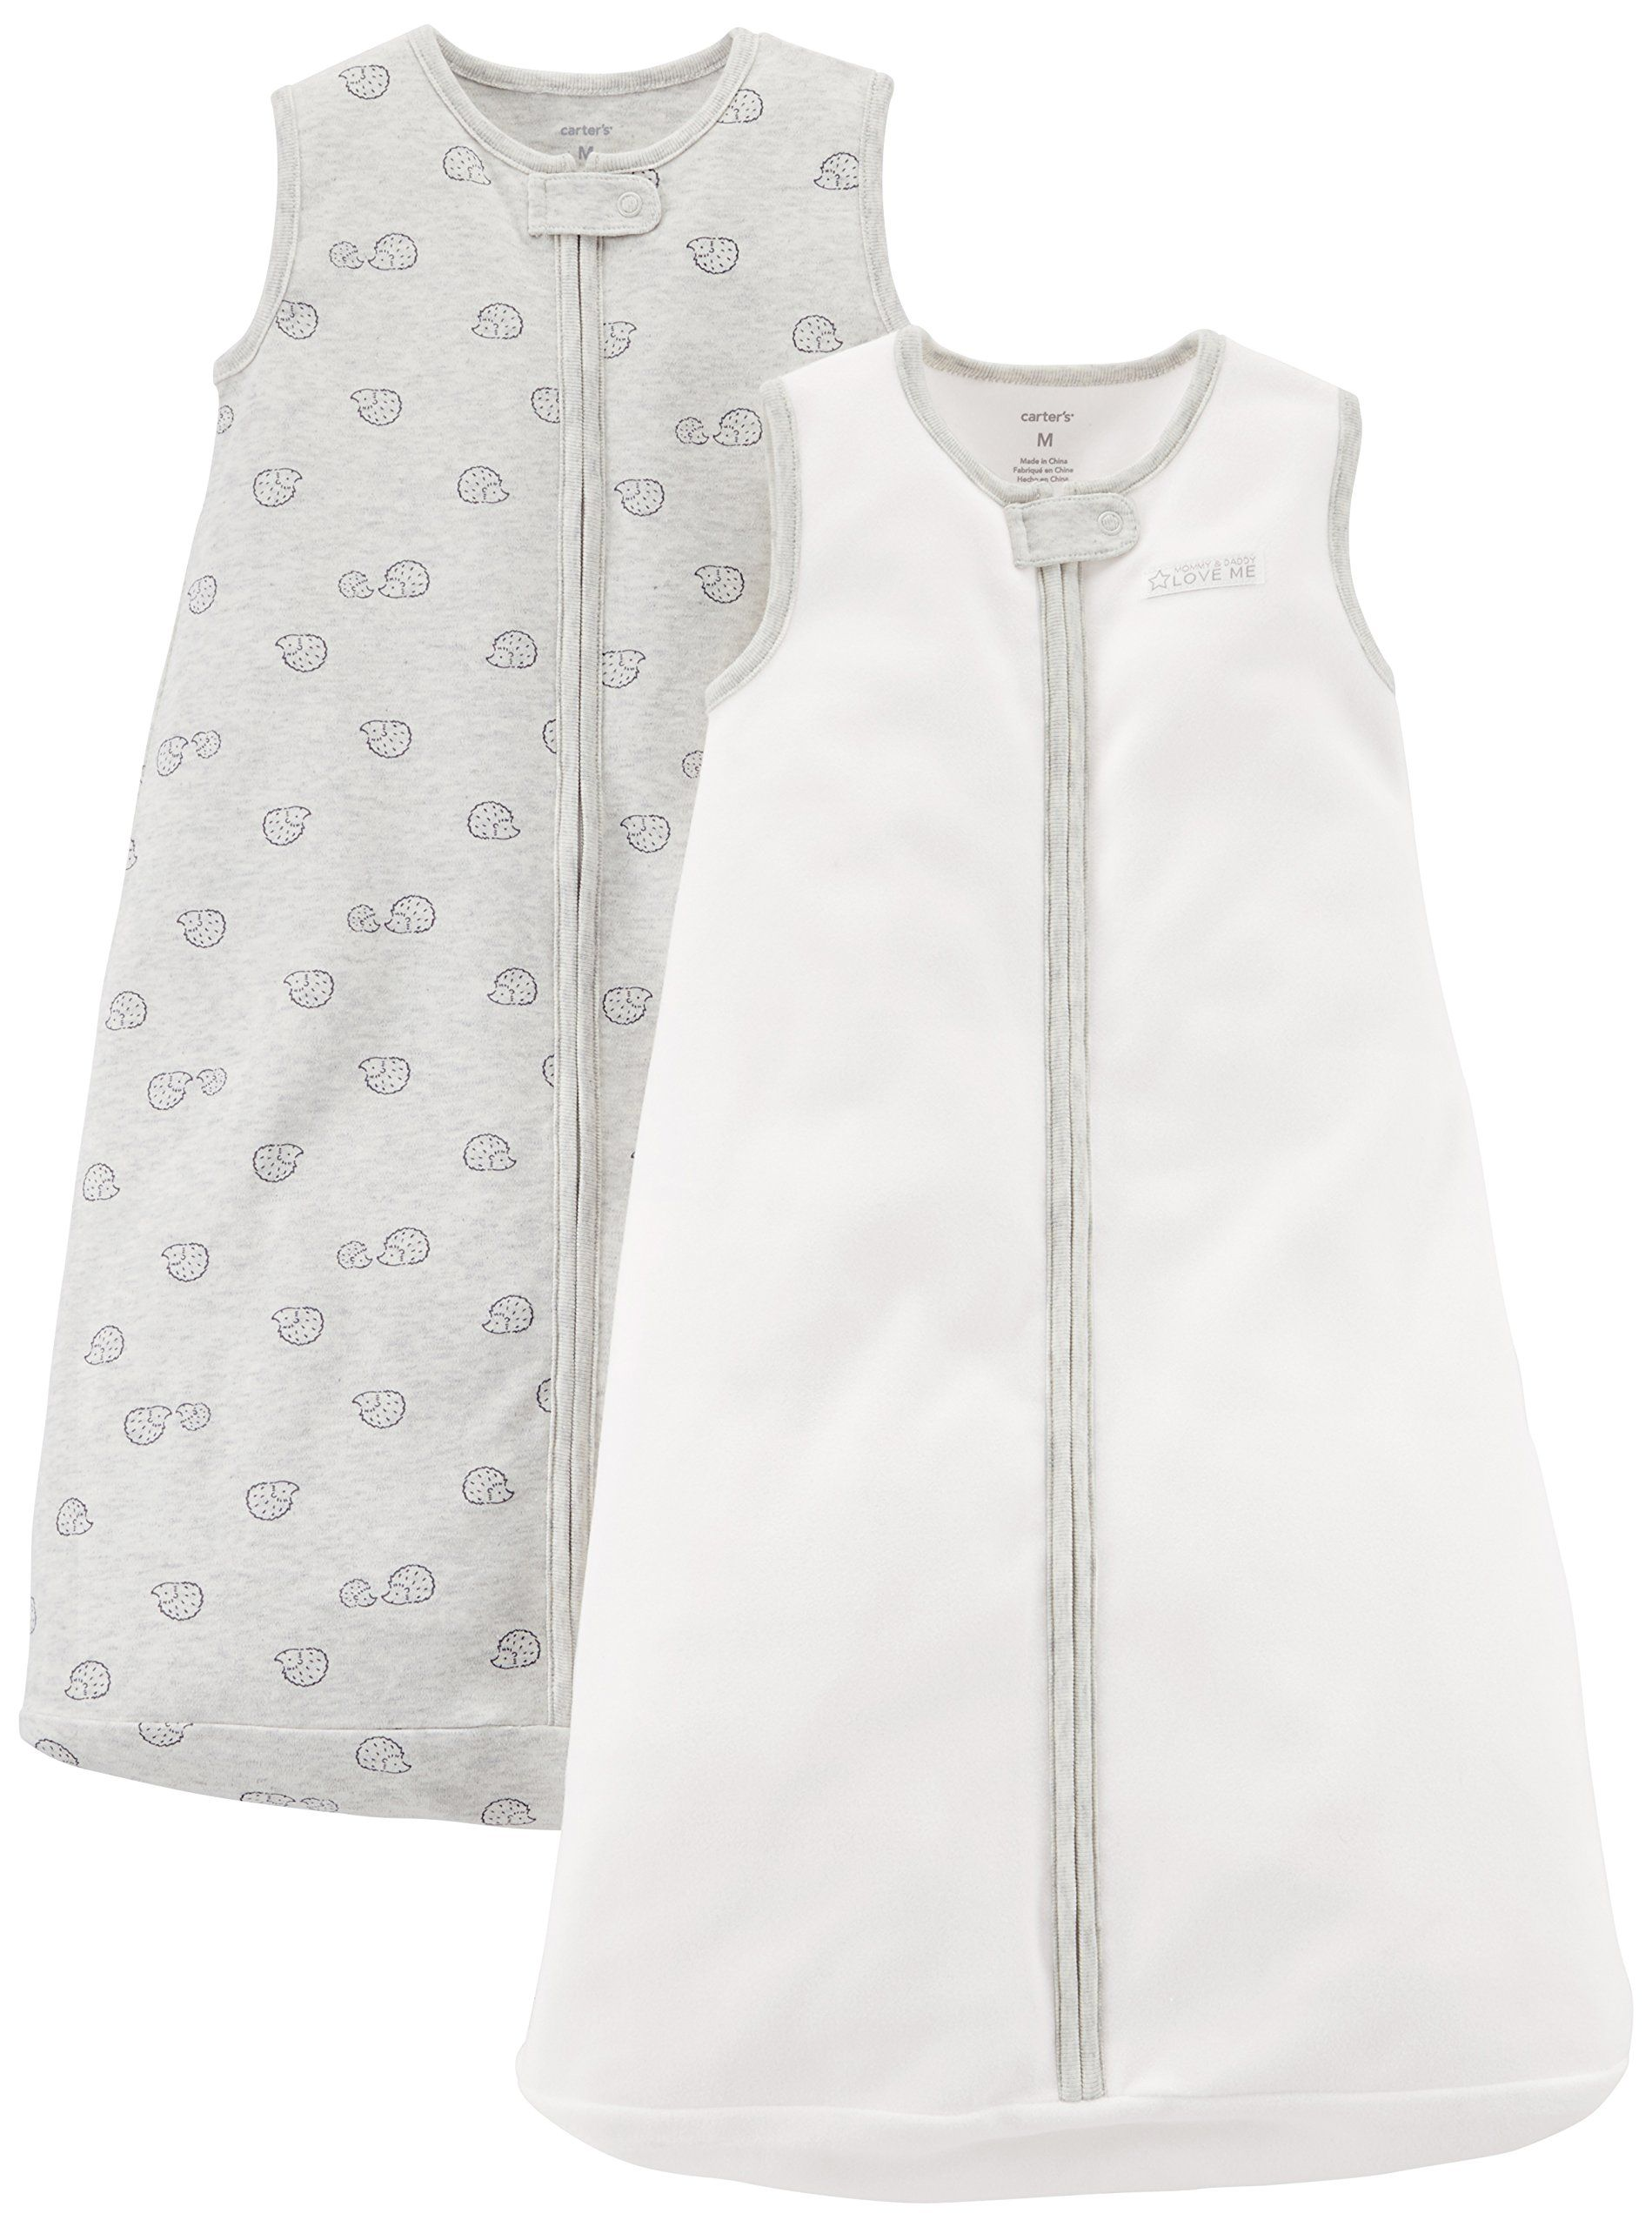 Simple Joys by Carters Baby Girls 3-Pack Cotton Sleeveless Sleepbag Wearable Blanket Pack of 3